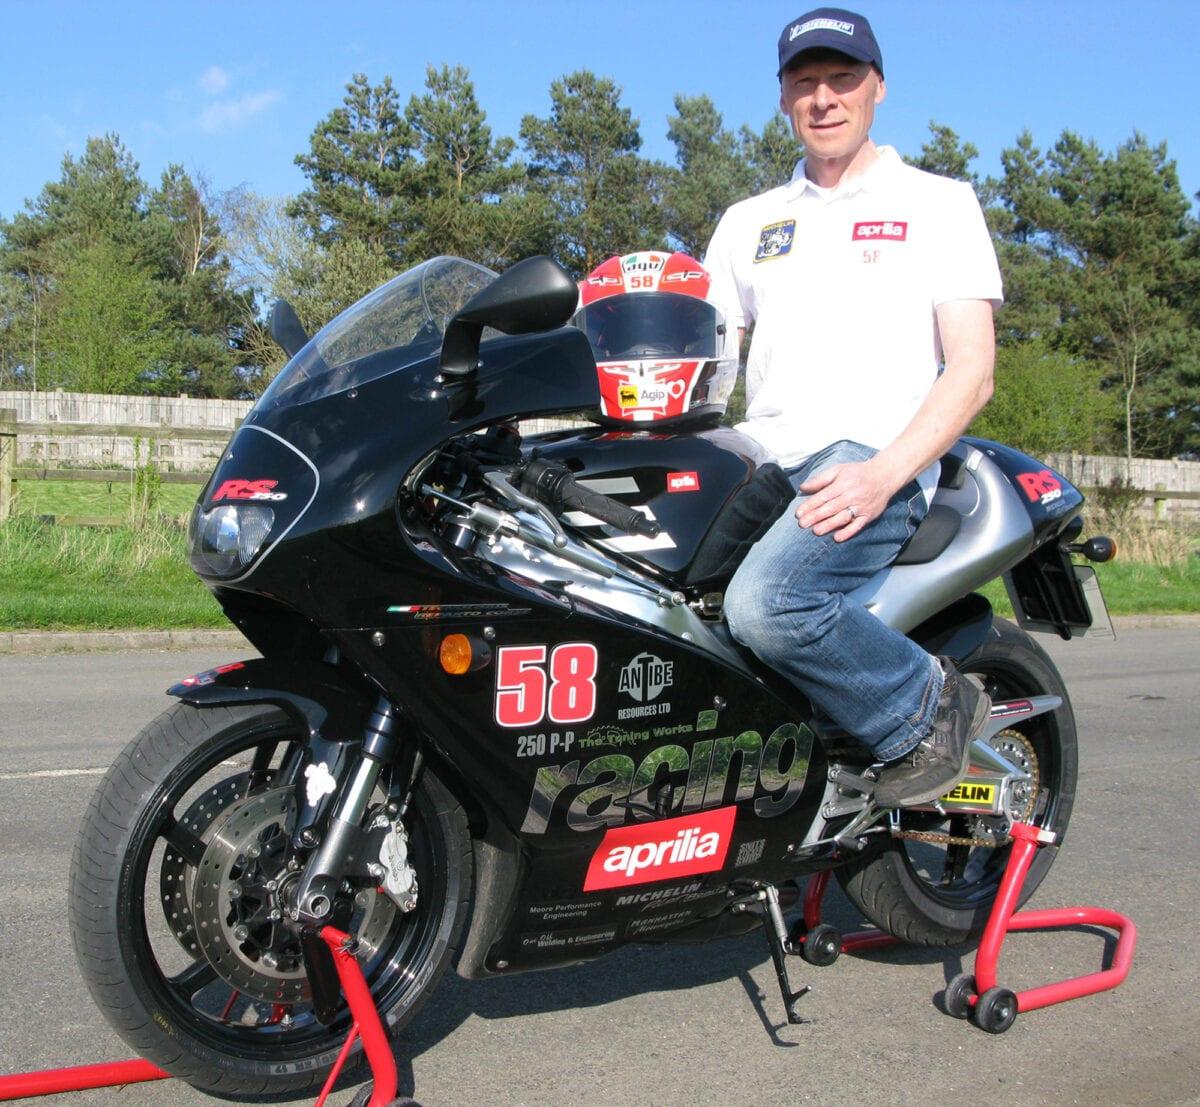 Michelin-Rider-Stuart-Swift-1